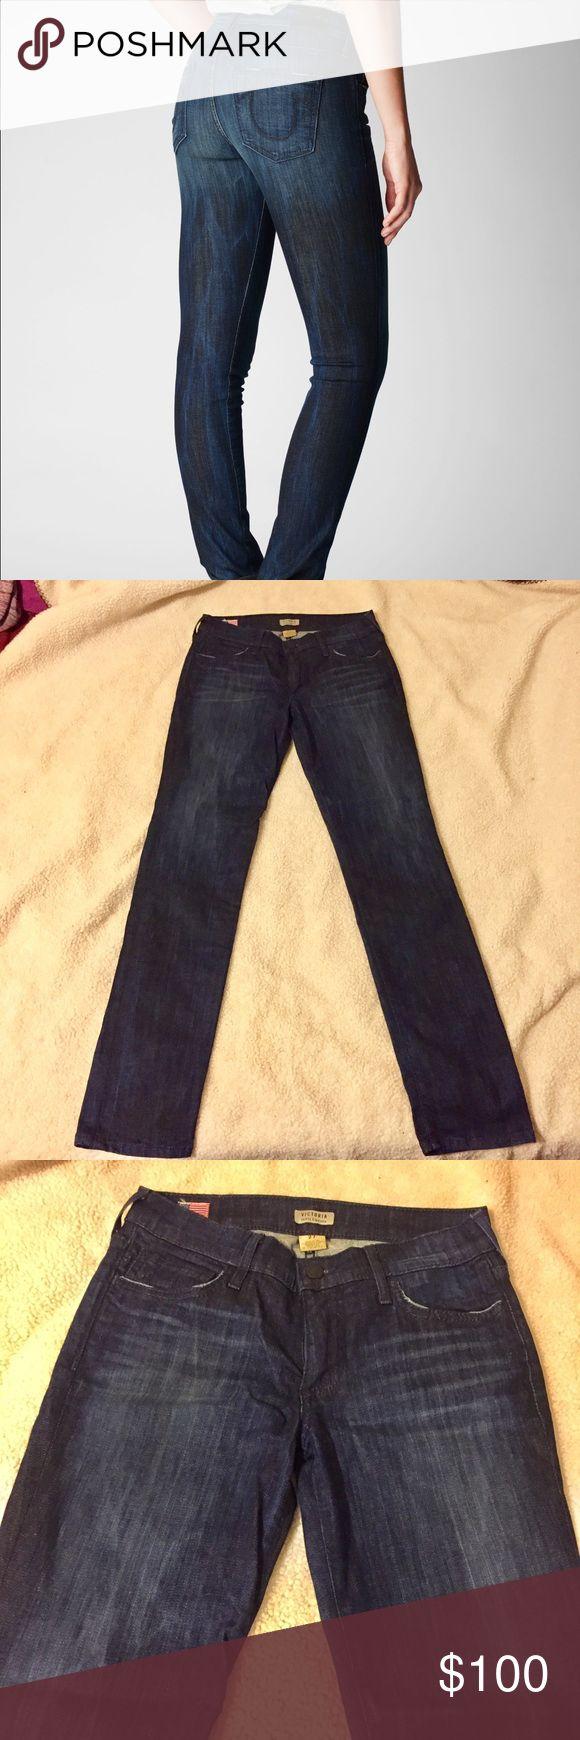 True Religion Denim Blue Jeans True Religion Denim Blue Jeans Victoria Mid Rise Skinny Cigarette Women's Jeans Only worn once! True Religion Jeans Skinny